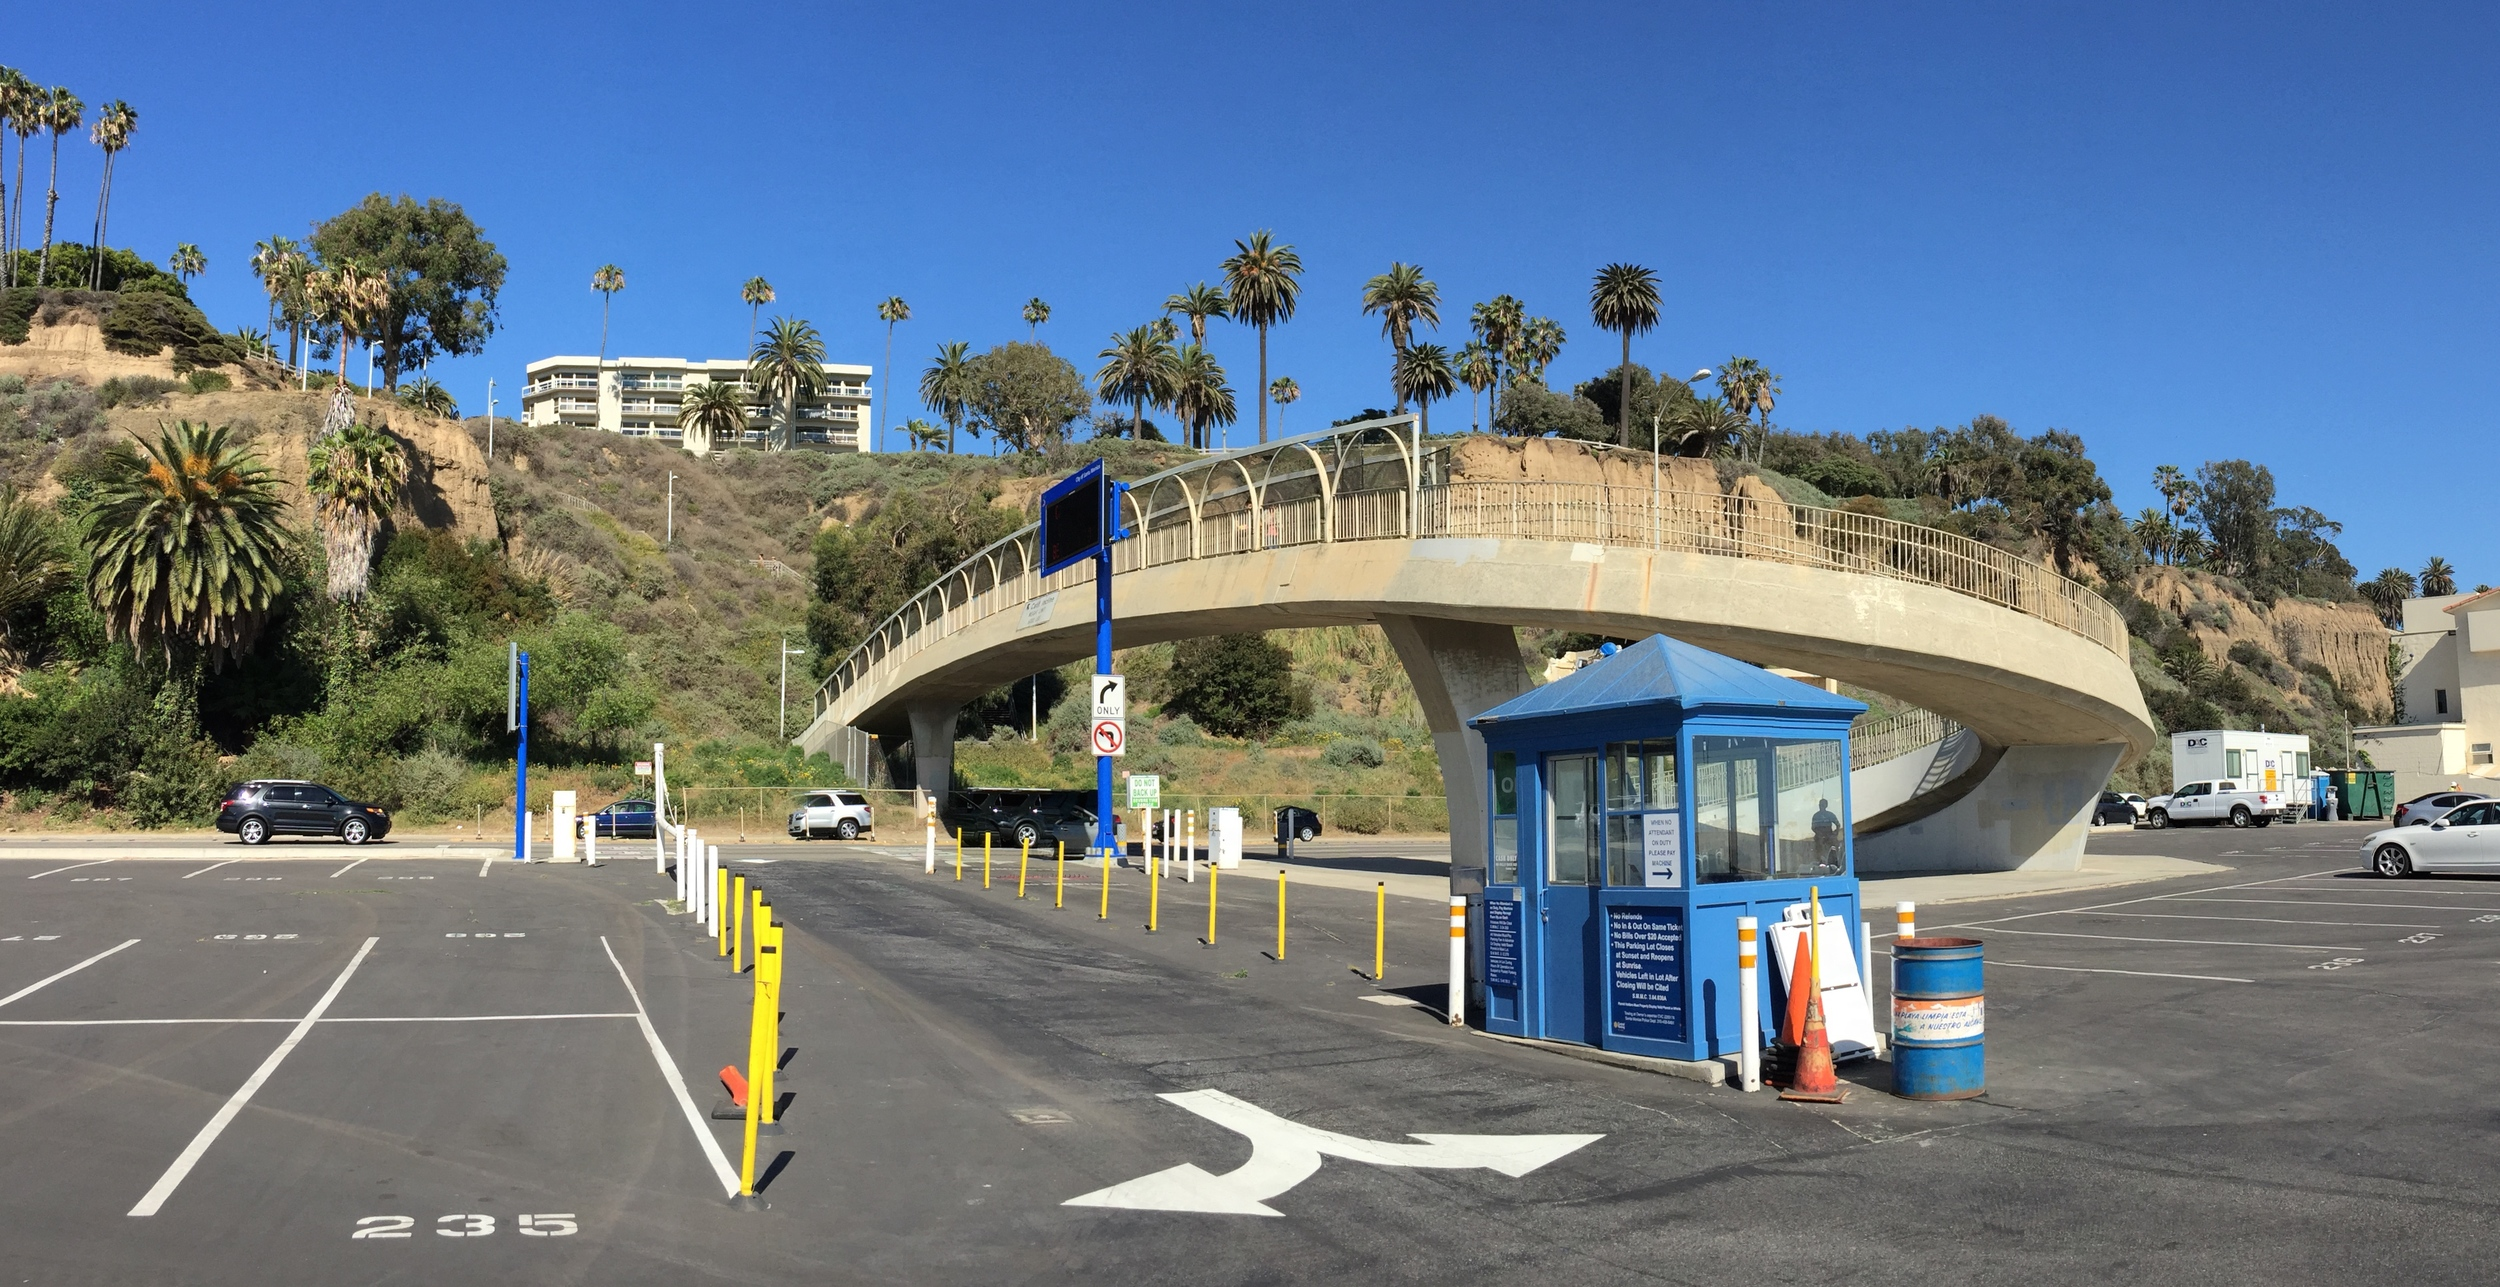 Entrance to LoT #8 parking lot.